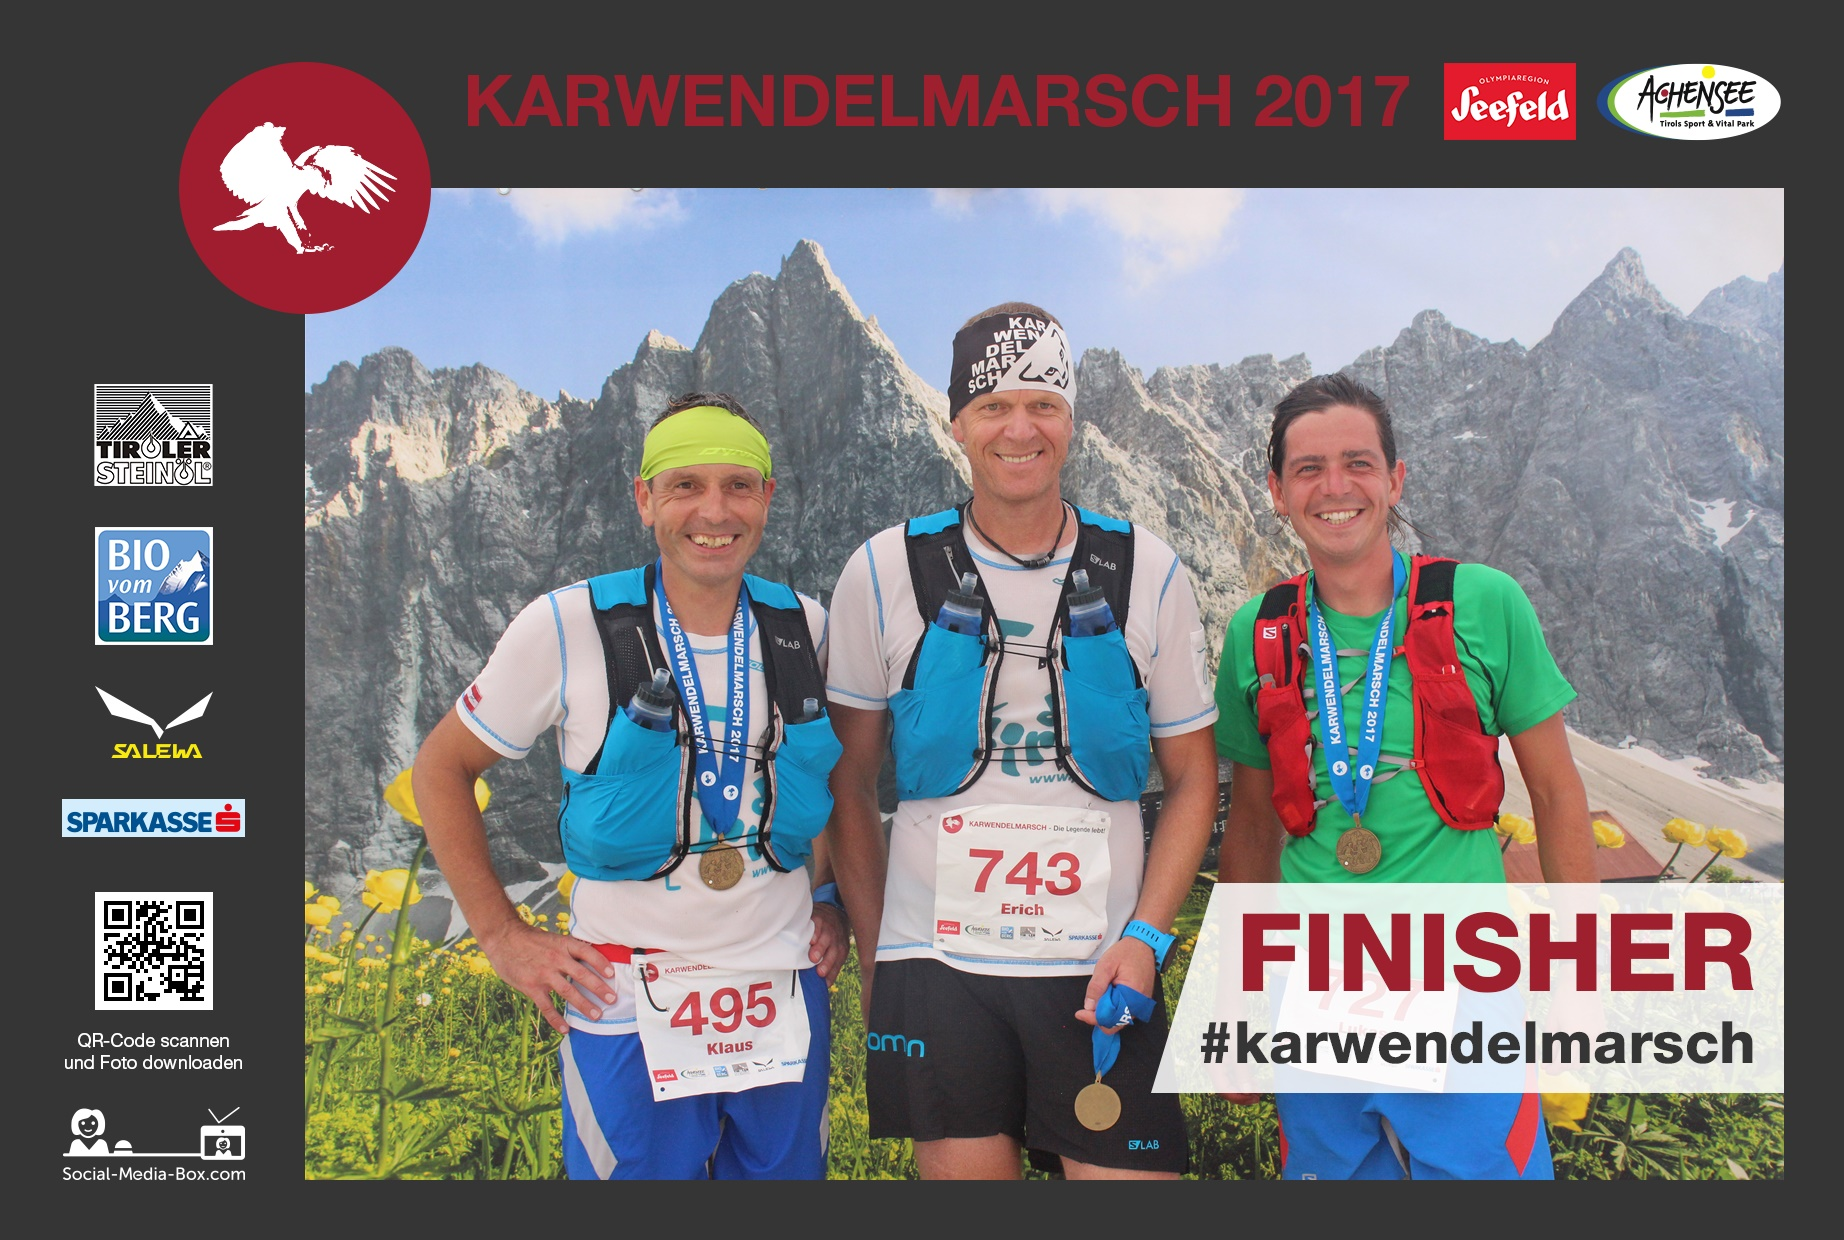 Karwendelmarsch2017_Finisher_Social-Media-Box_Print1